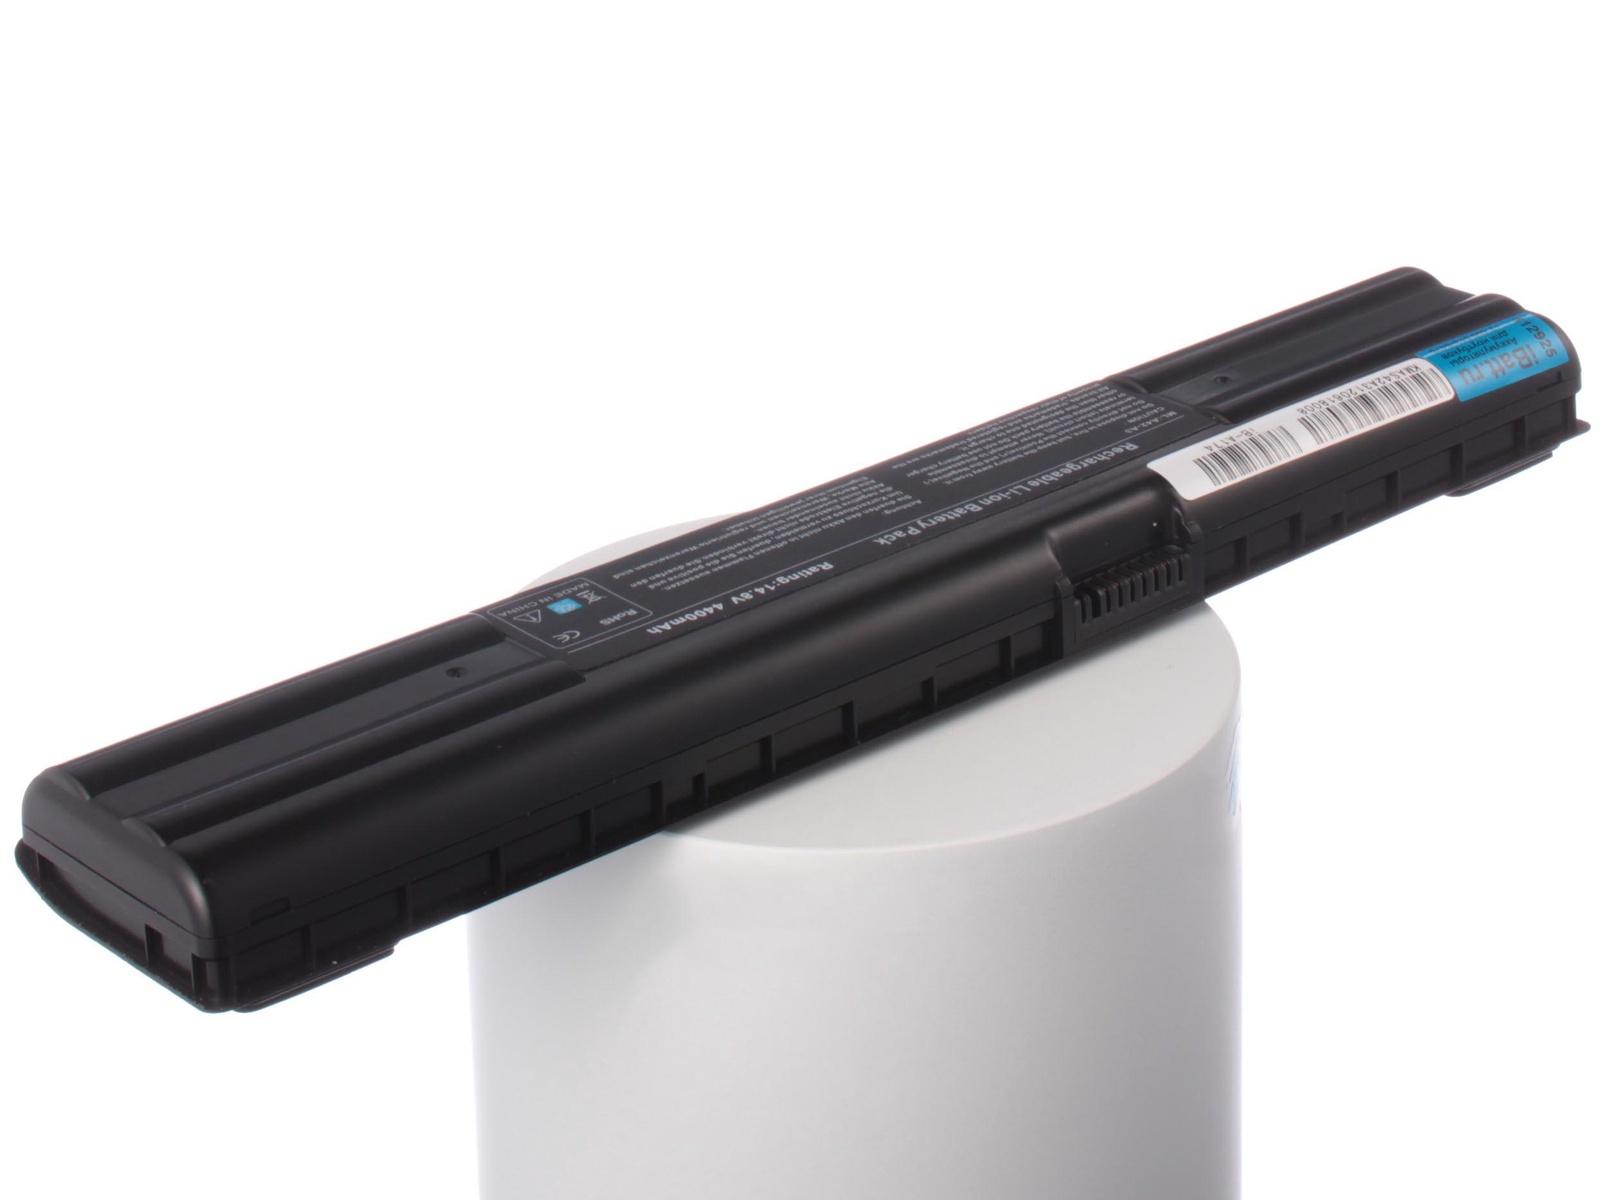 цена на Аккумулятор для ноутбука iBatt для Asus A3000, A6R, G2S, G1S, A7V, A6M, A7U, A3A, A7M, A3L, A6J, A6G, A3E, A3N, A3F, A7J, A6T, A3H, A6Rp, Z9100, A6K, A7Sv, A7D, Z81, A7T, A3G, A3500L, A3V, G1Sn, A7C, A7G, G2Sg, G2P, A7SN, Z9000